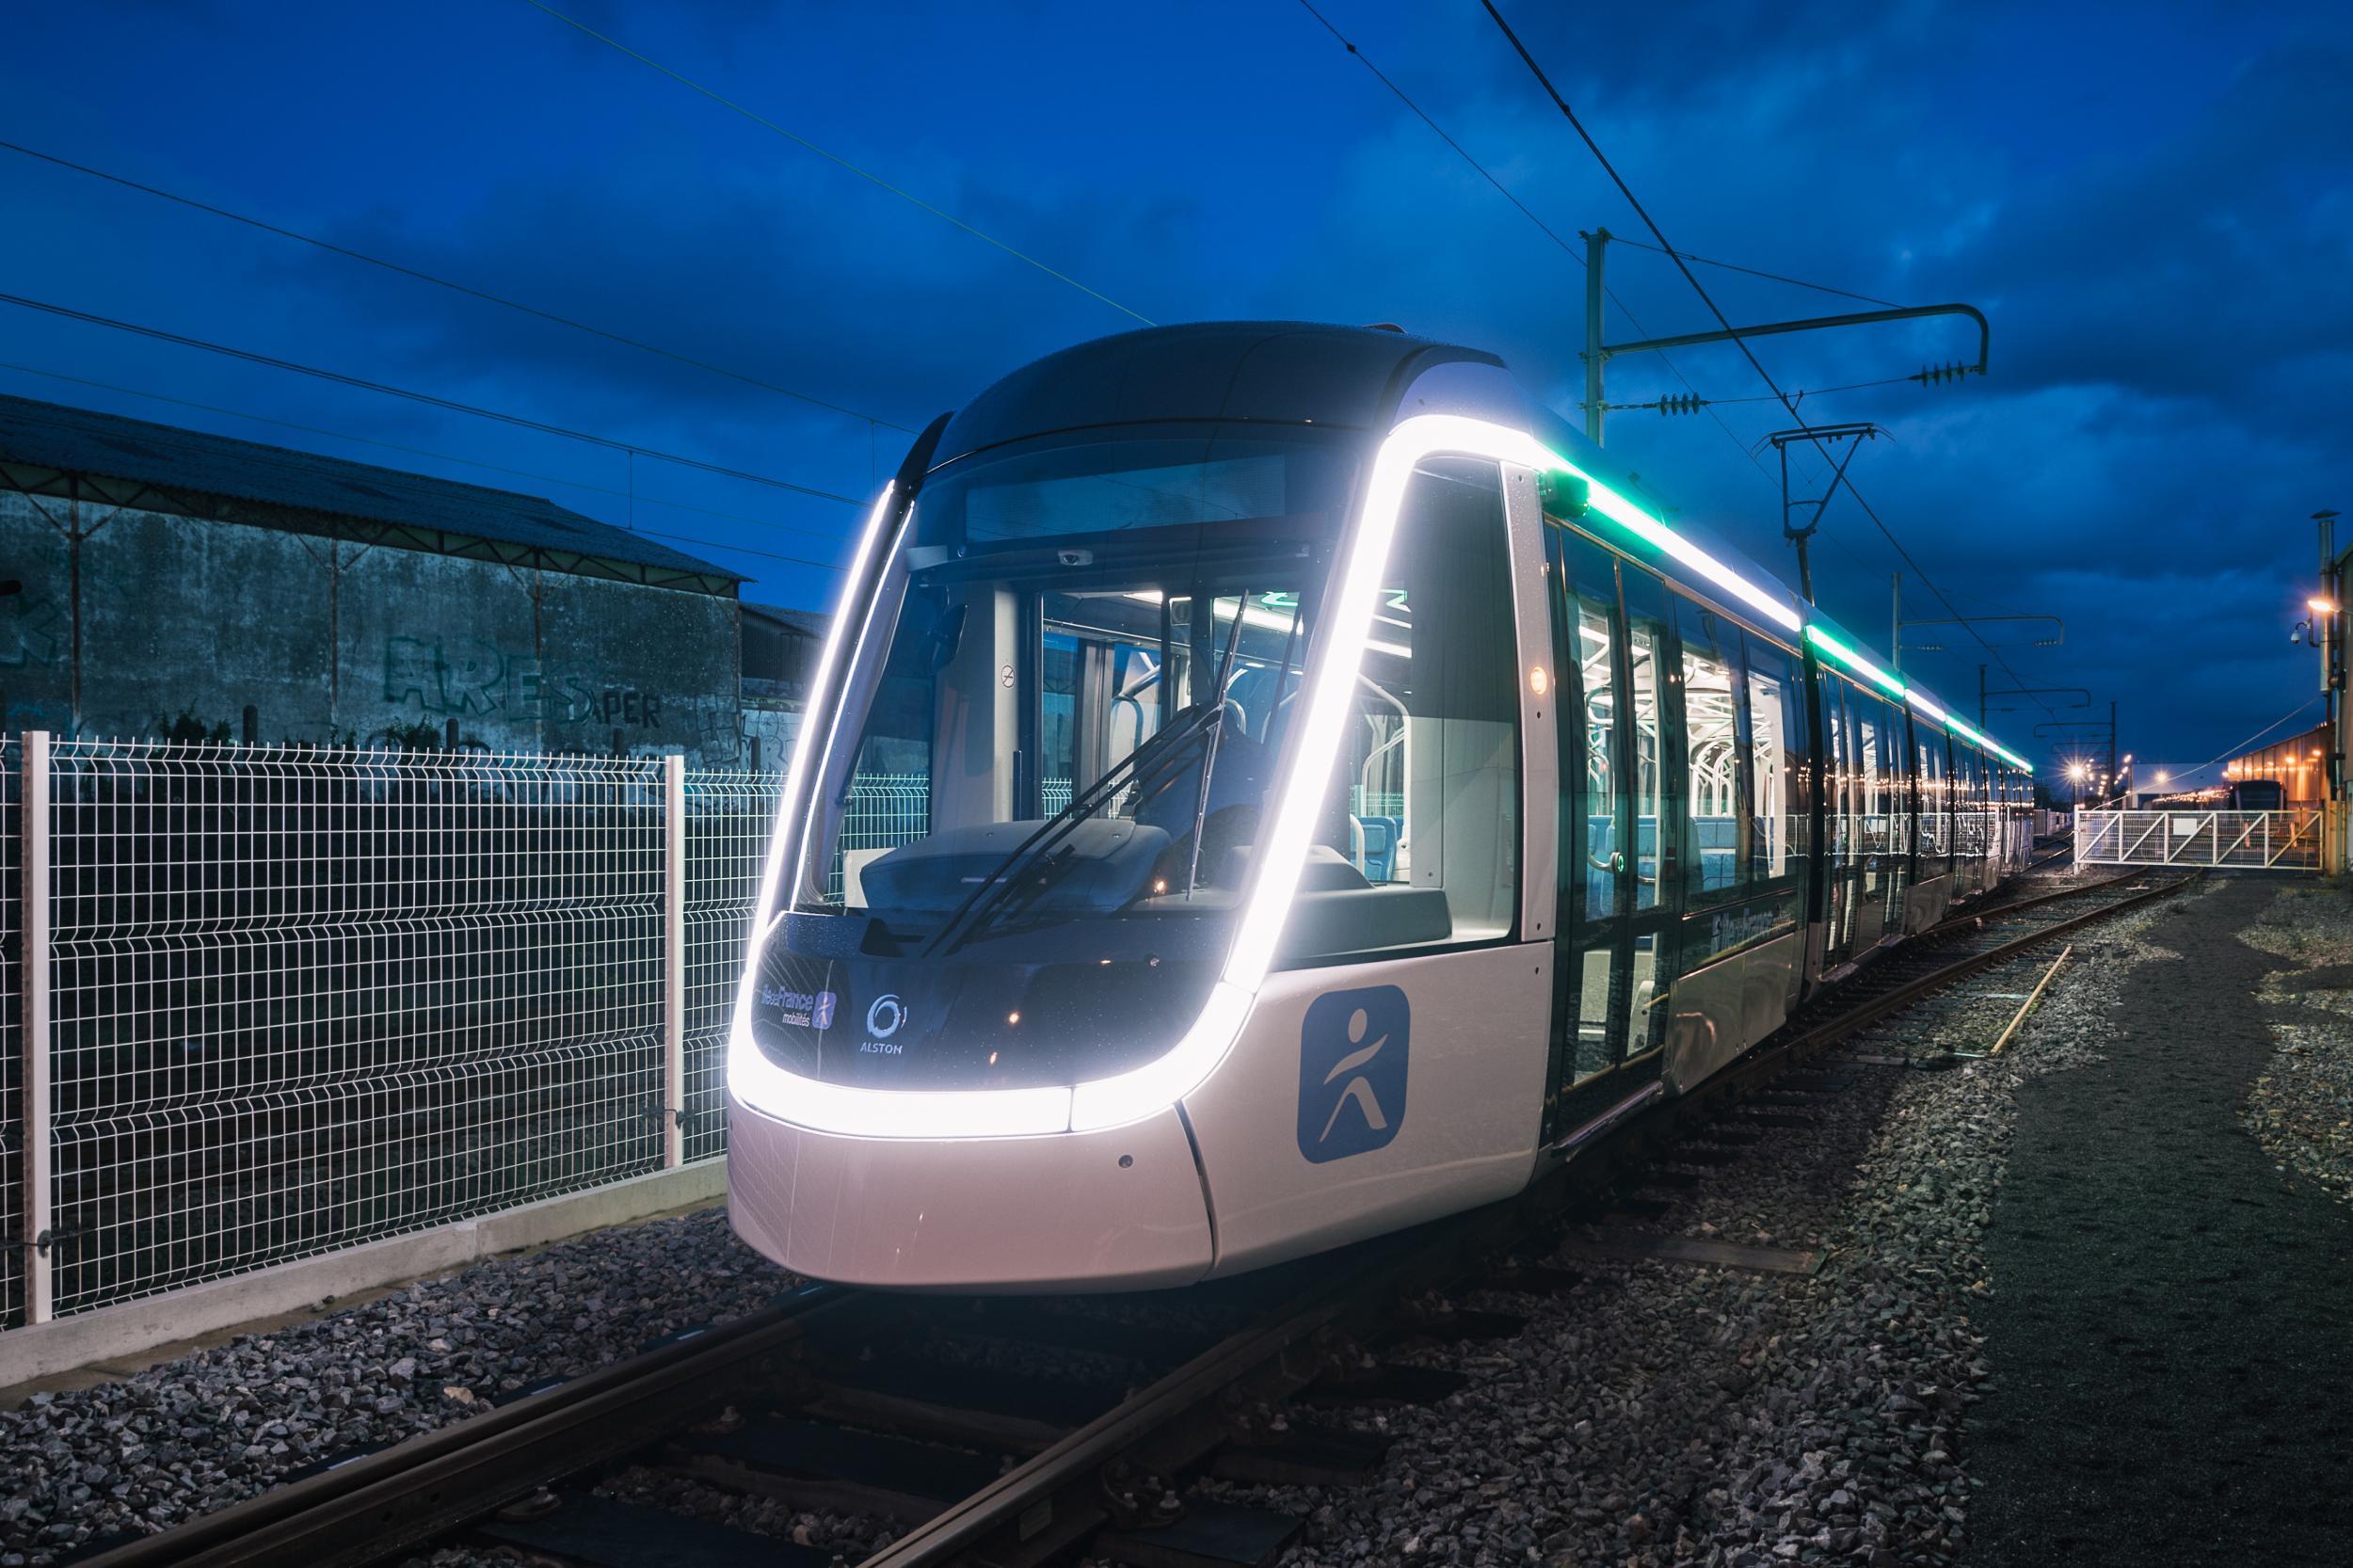 Alstom Citadis X05 Tram for T9 Ile-de-France line